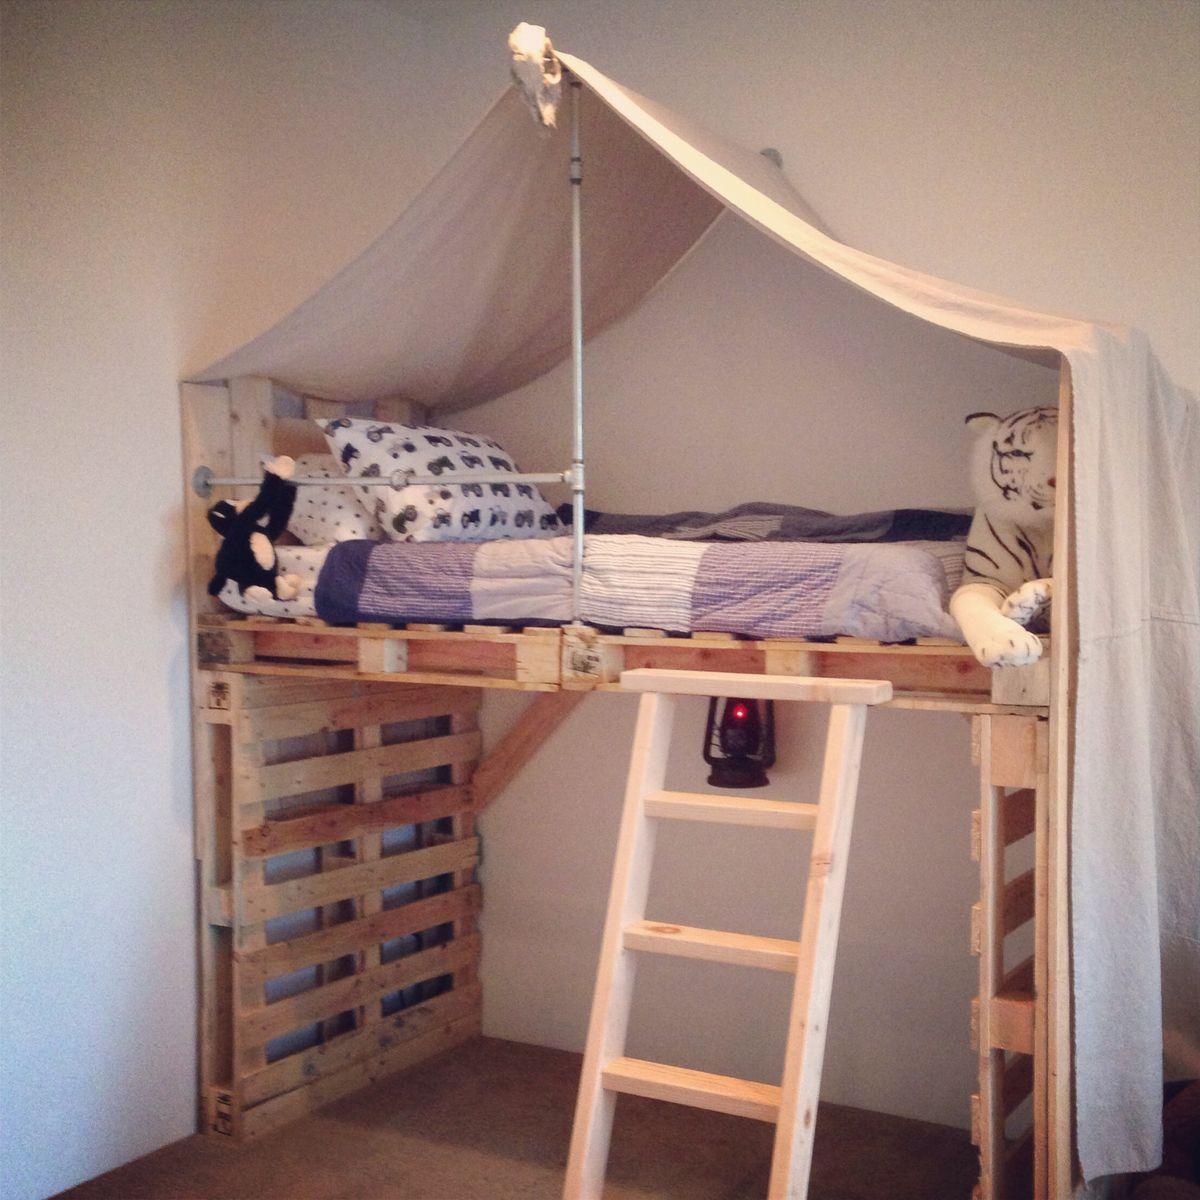 Loft bedroom for boys  baffddddaaccg  pixels  DIY and